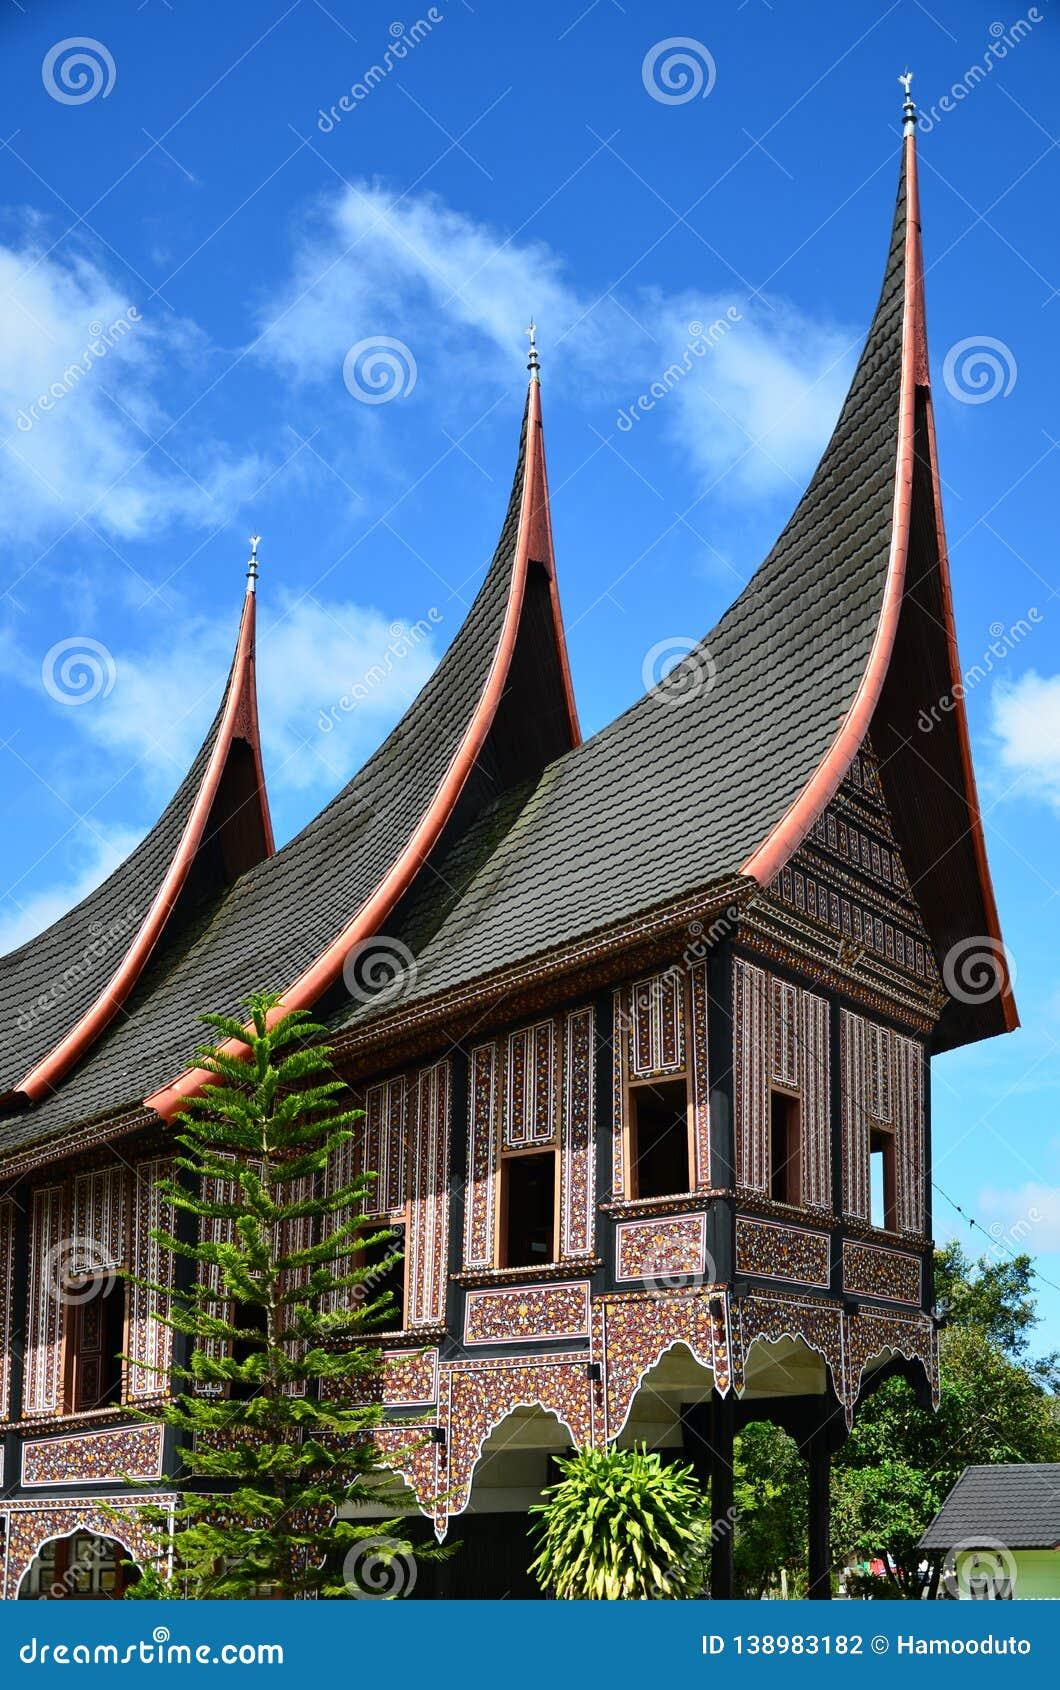 rumah gadang minangkabau traditional house 138983182